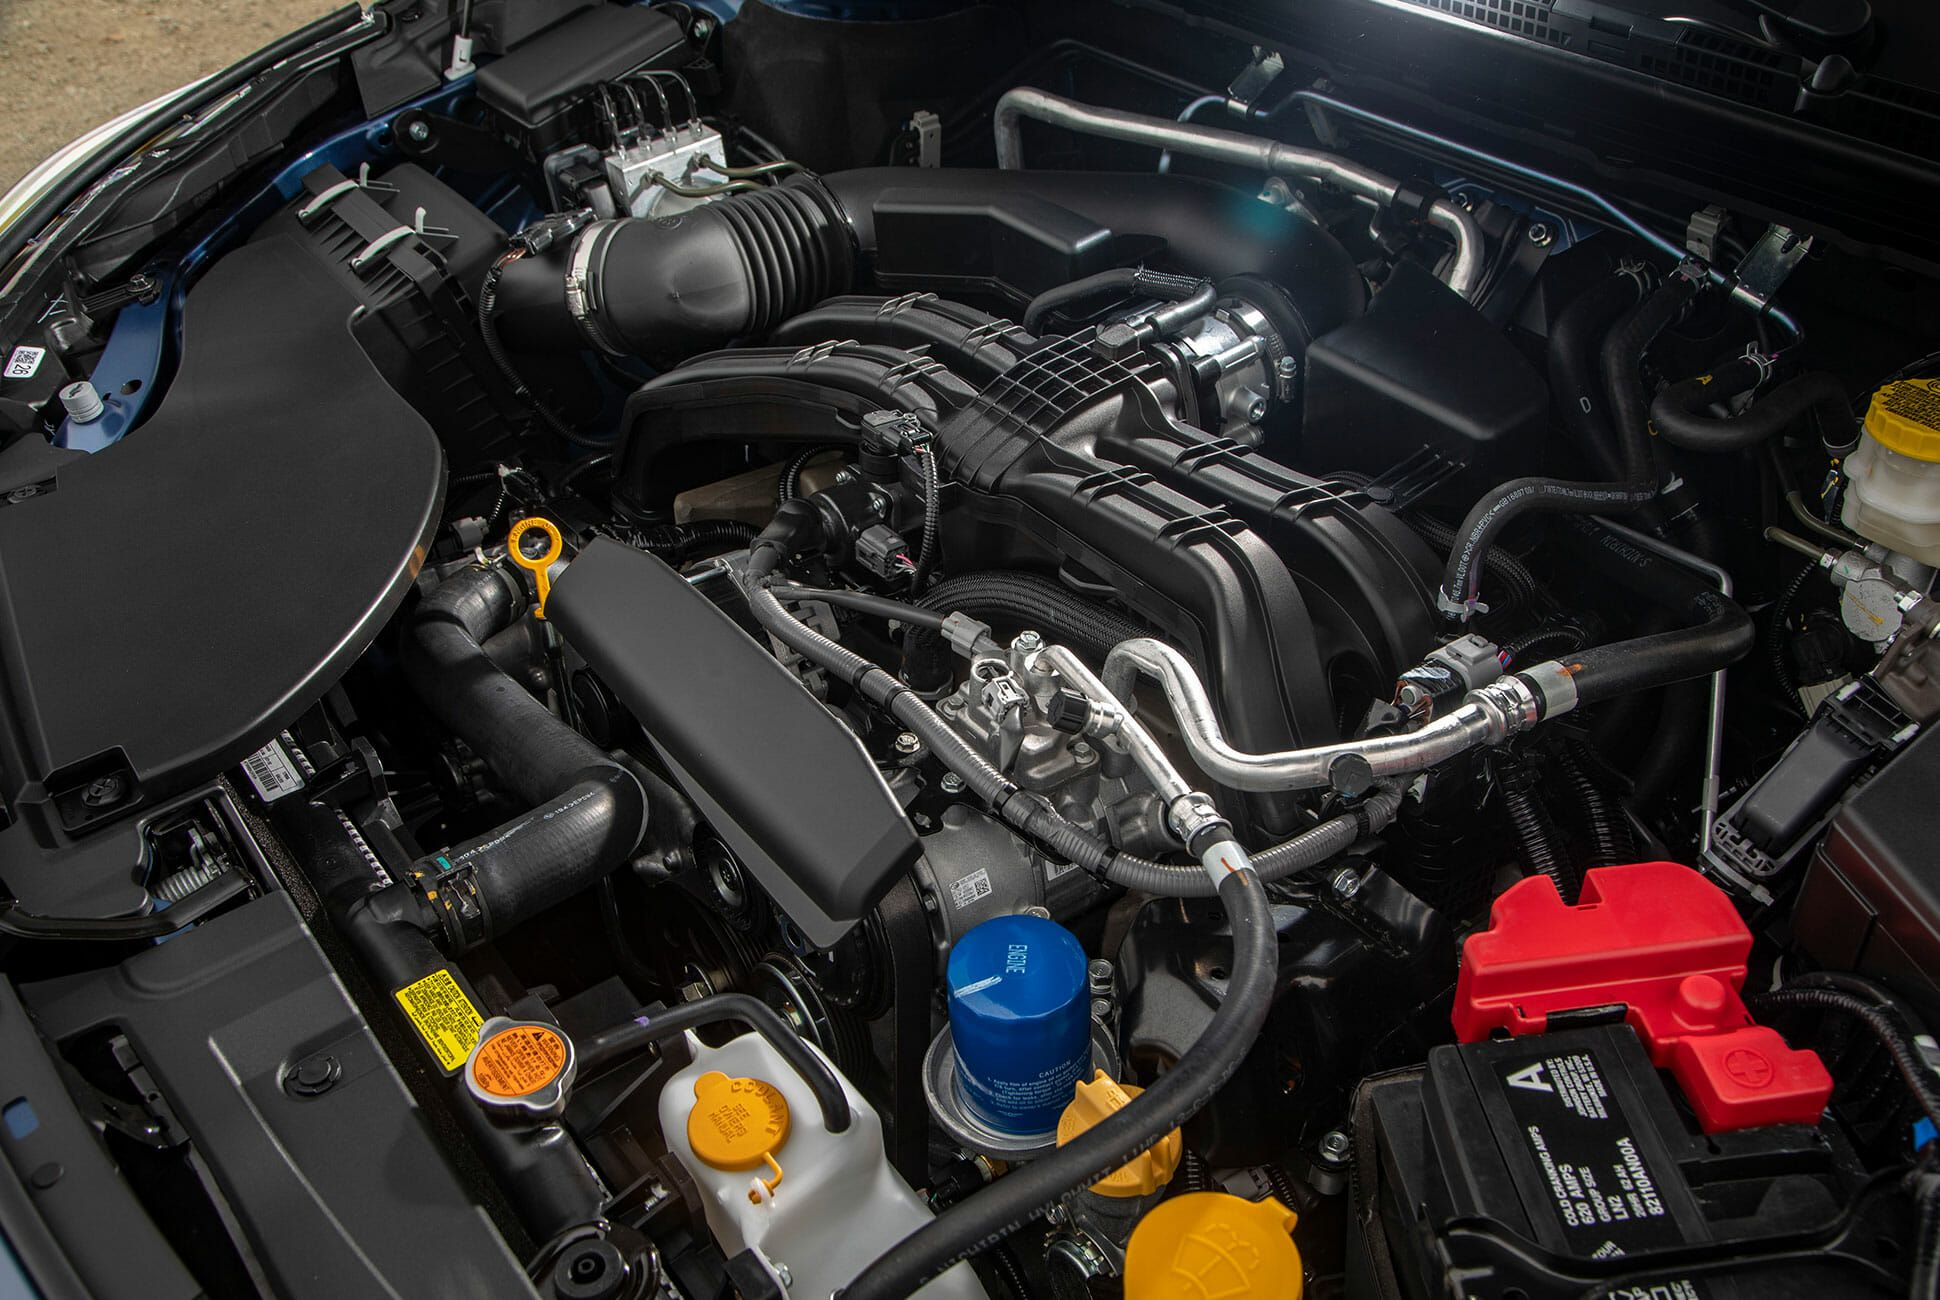 2020-Subaru-Outback-Review-gear-patrol-slide-5